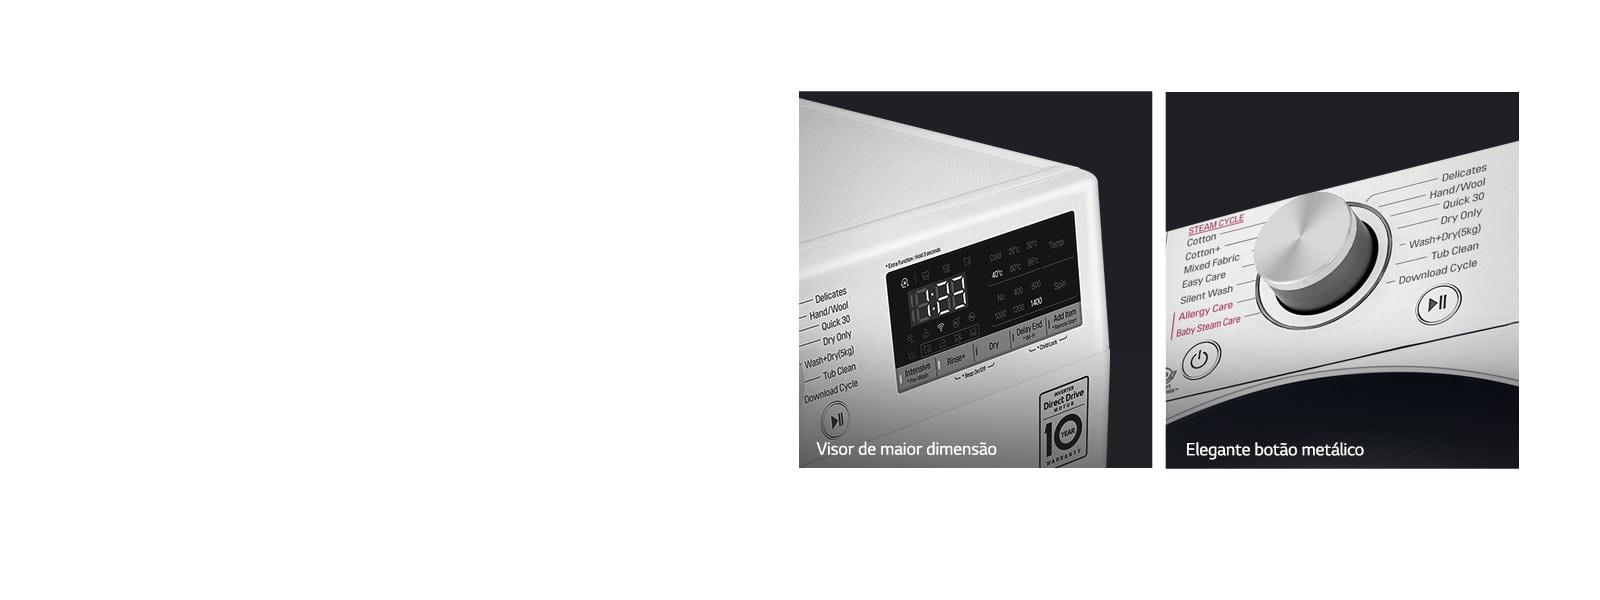 WM-Vivace-V400-C4R-White-07-Design-Desktop-v1